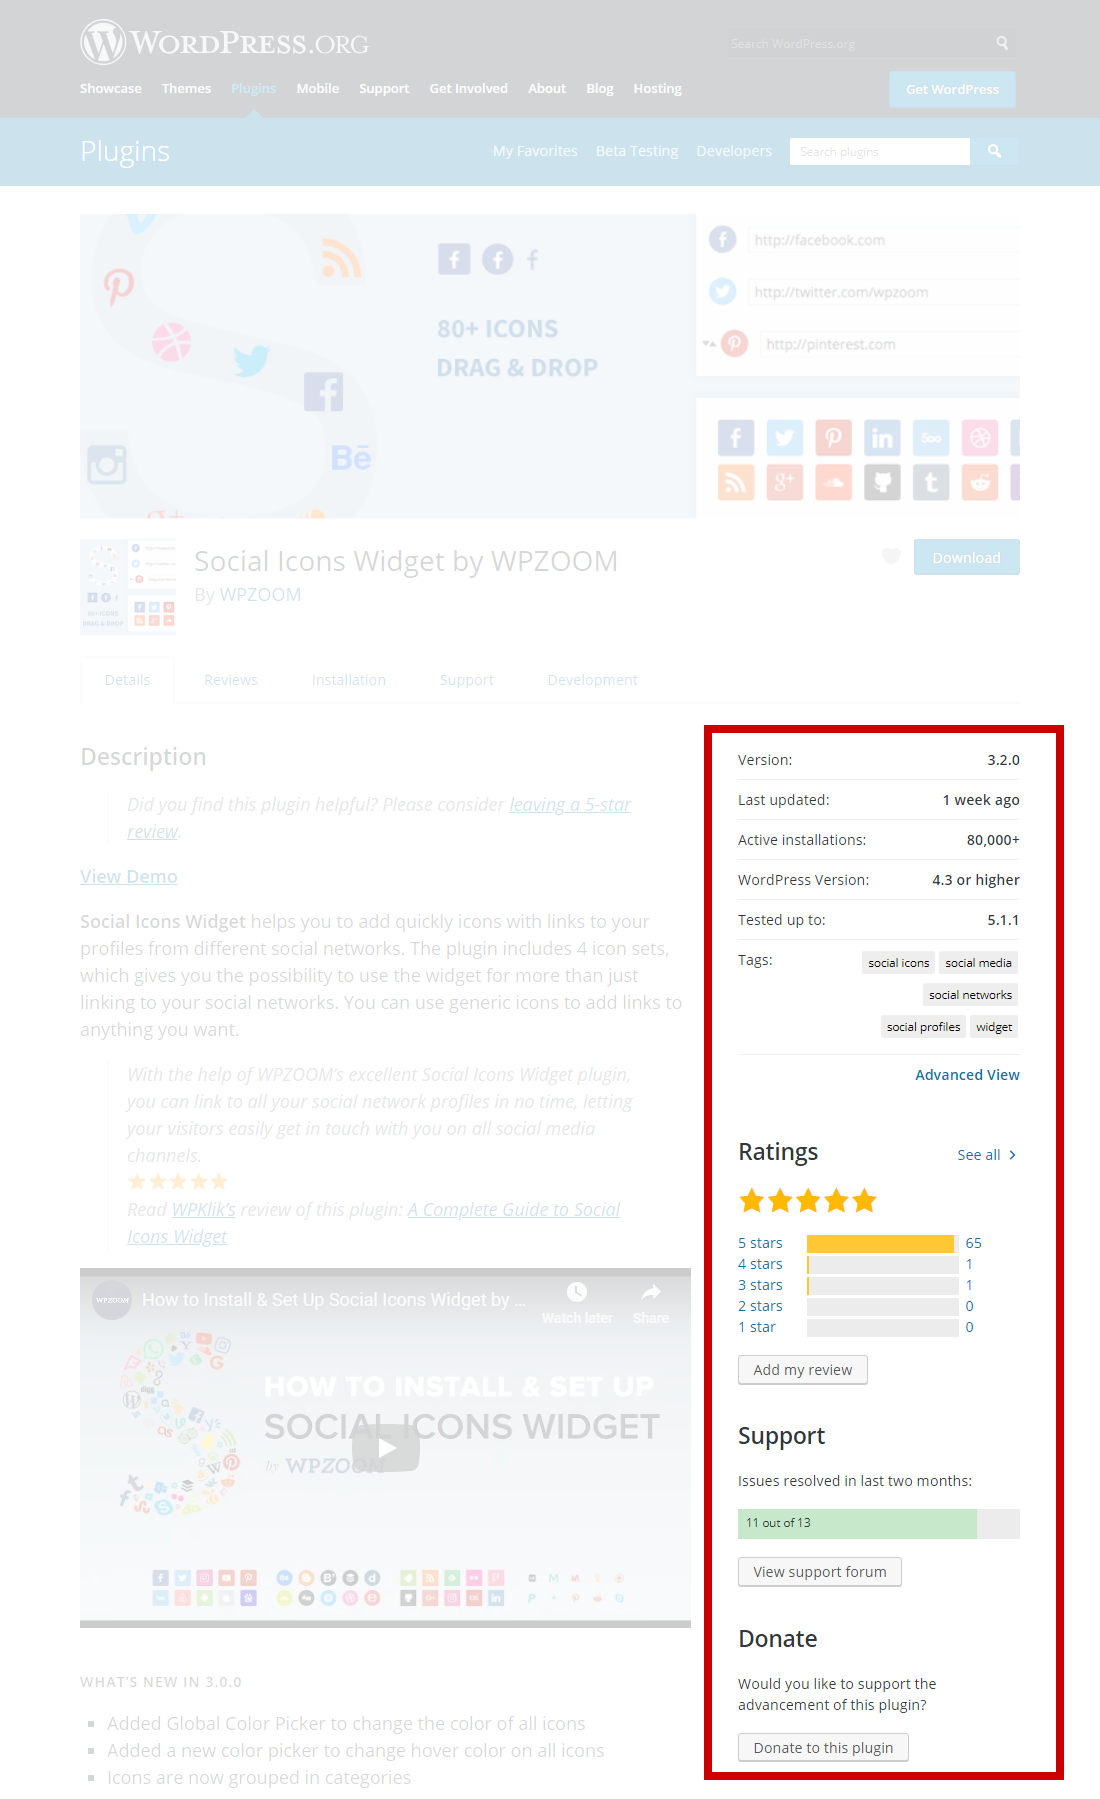 An Analysis of 18,087 WordPress org Plugins | I Love WordPress